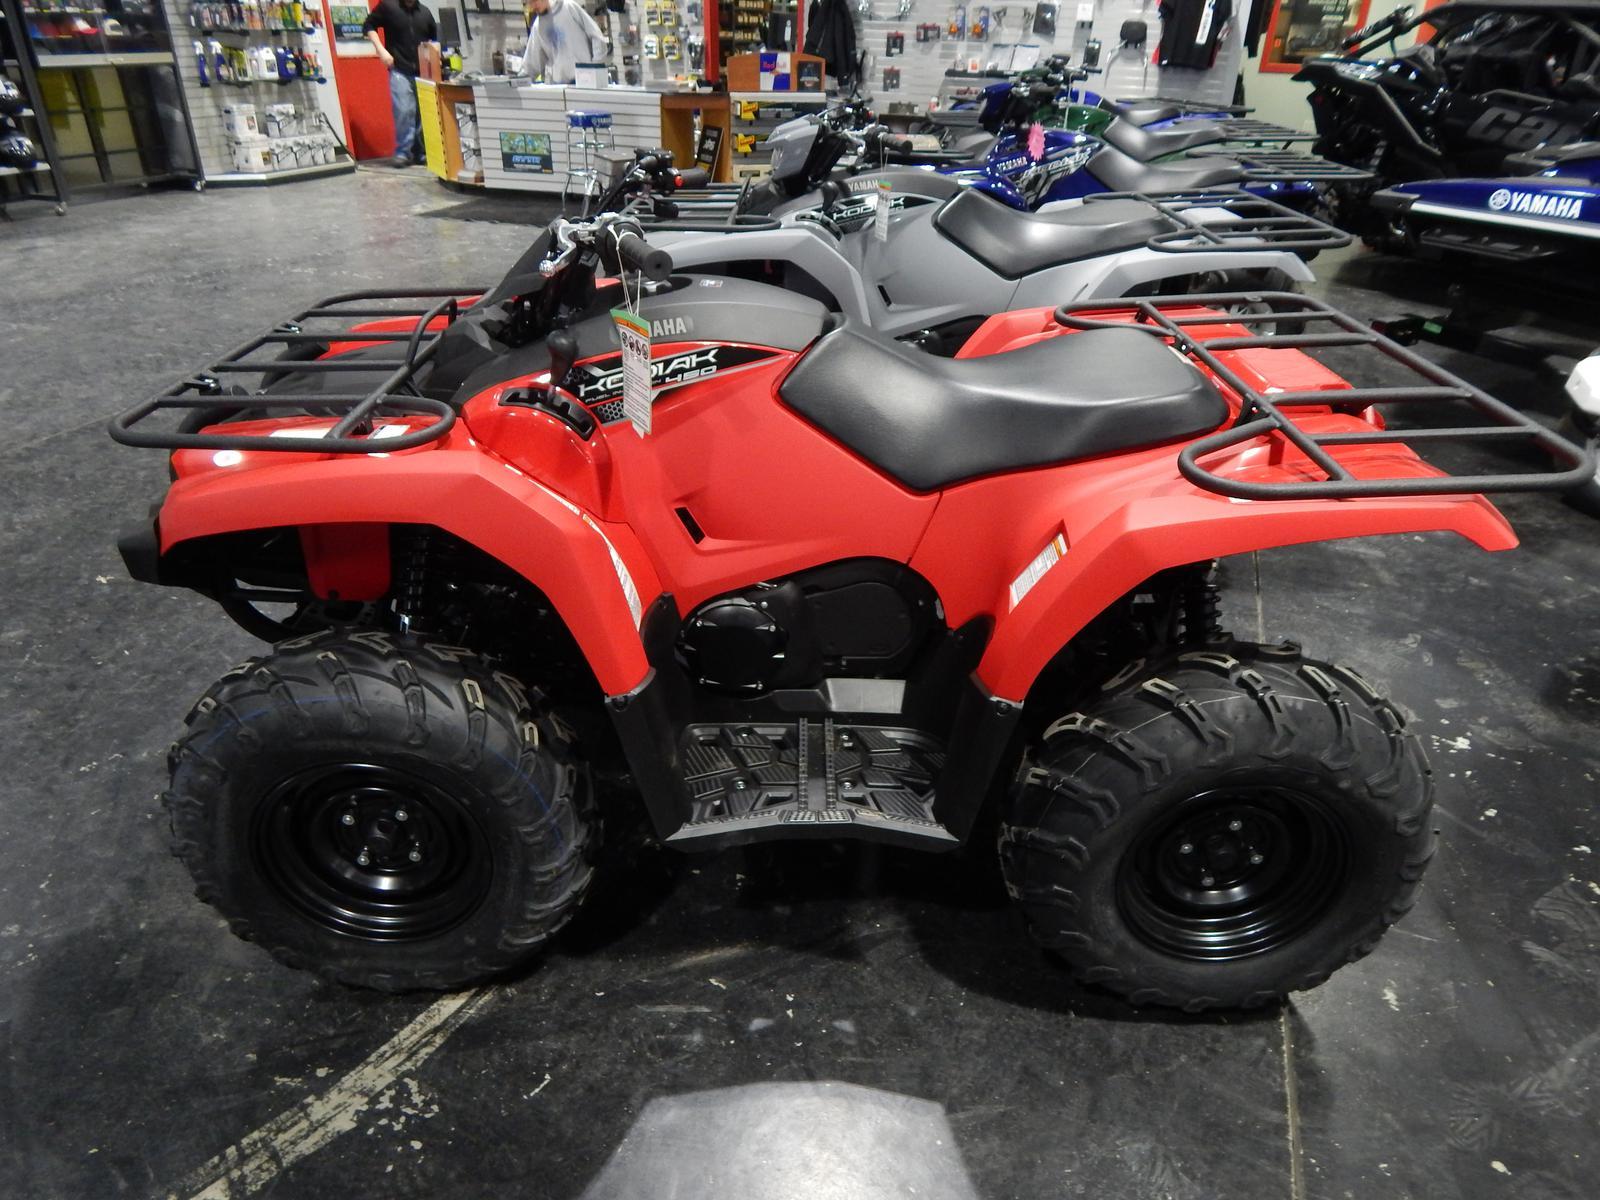 2018 Yamaha Kodiak 450 For Sale In Morehead Ky Cave Run Mahindra Wiring Diagram Motorsports 606 784 2300